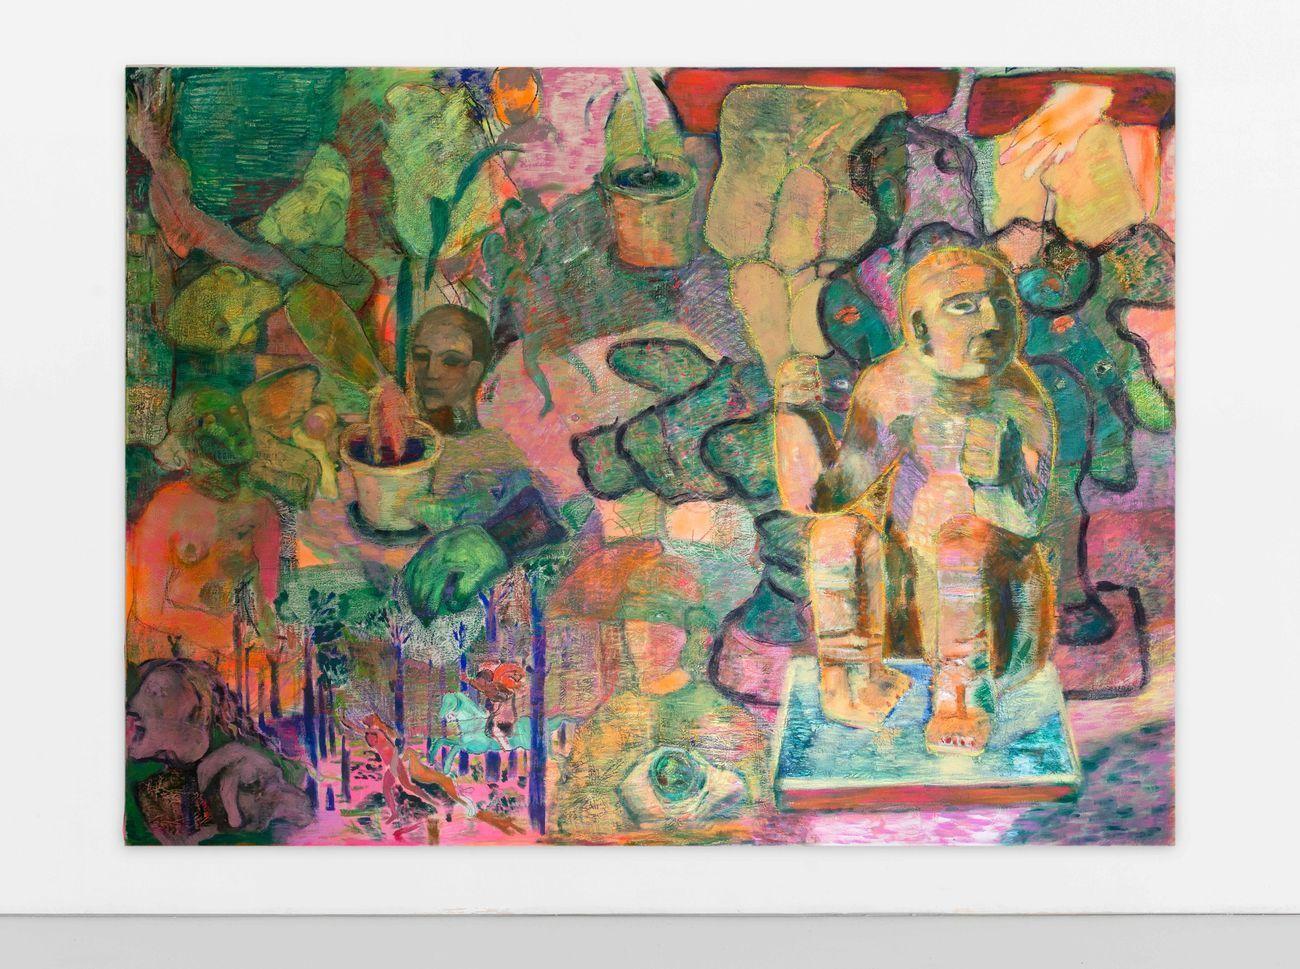 Paola Angelini, Collection, 2019. Tecnica mista su tela, cm 200x270